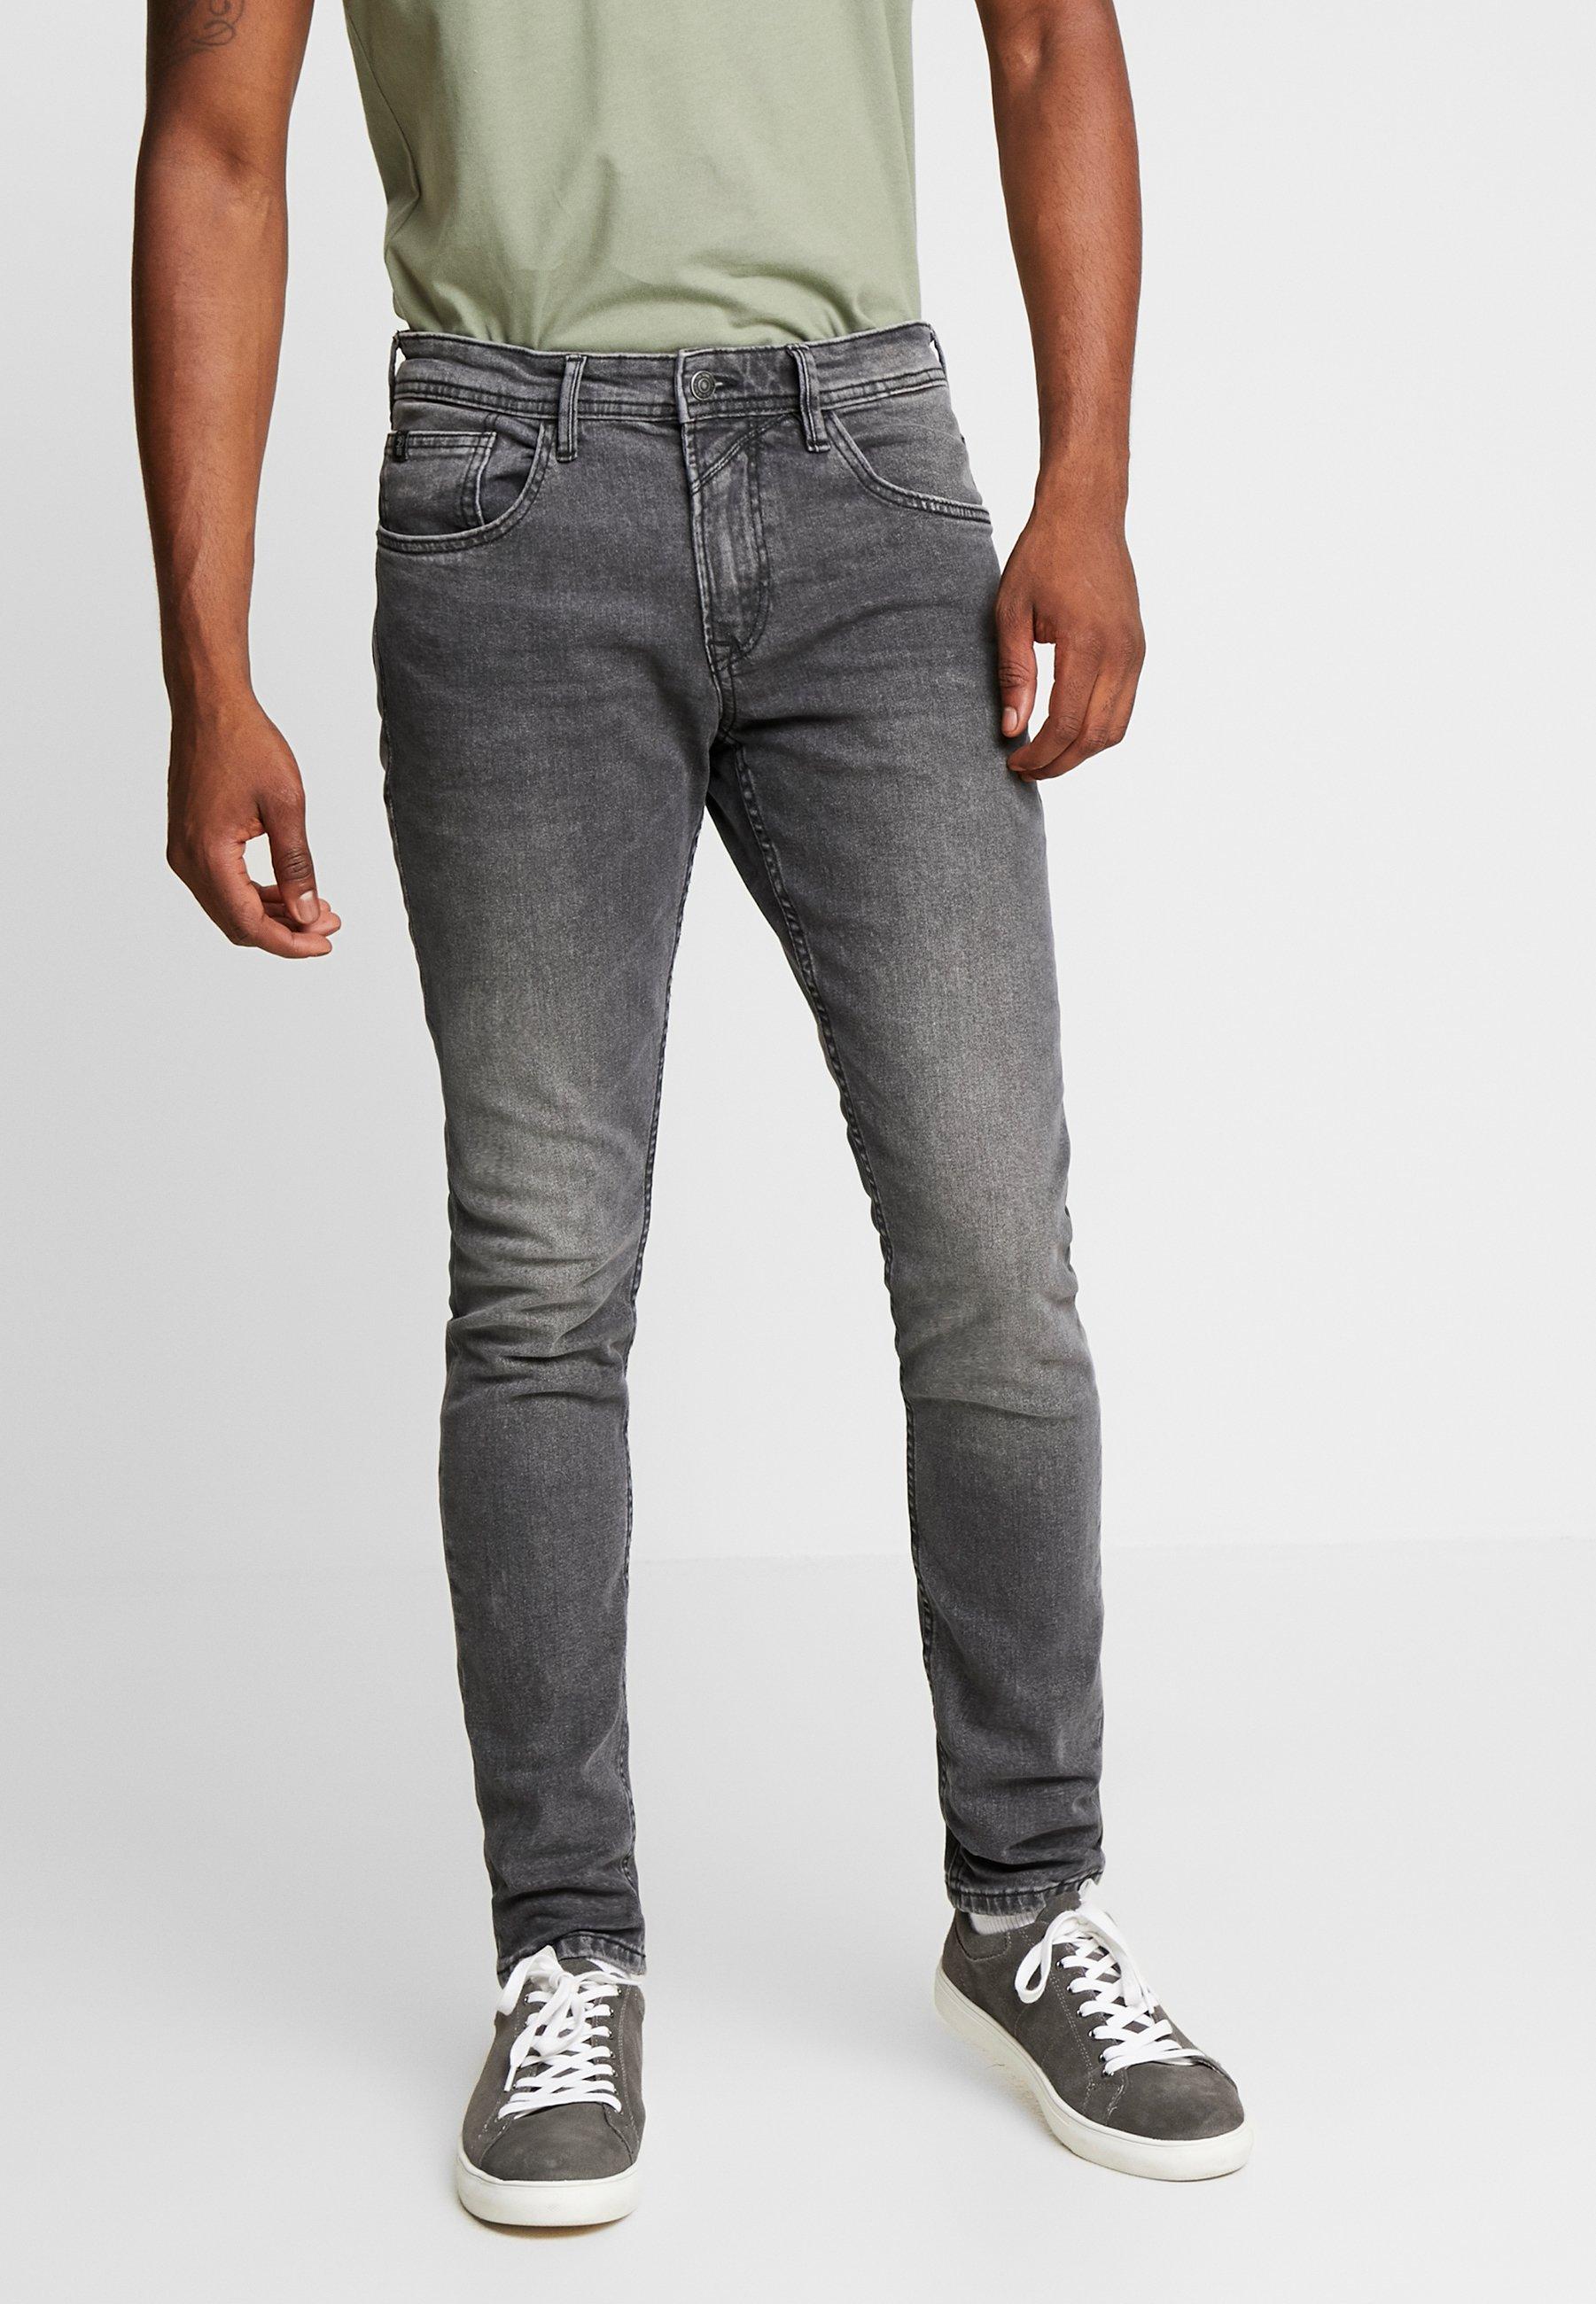 TOM TAILOR DENIM CULVER STRETCH - Jeansy Skinny Fit - used mid stone black /denim grey